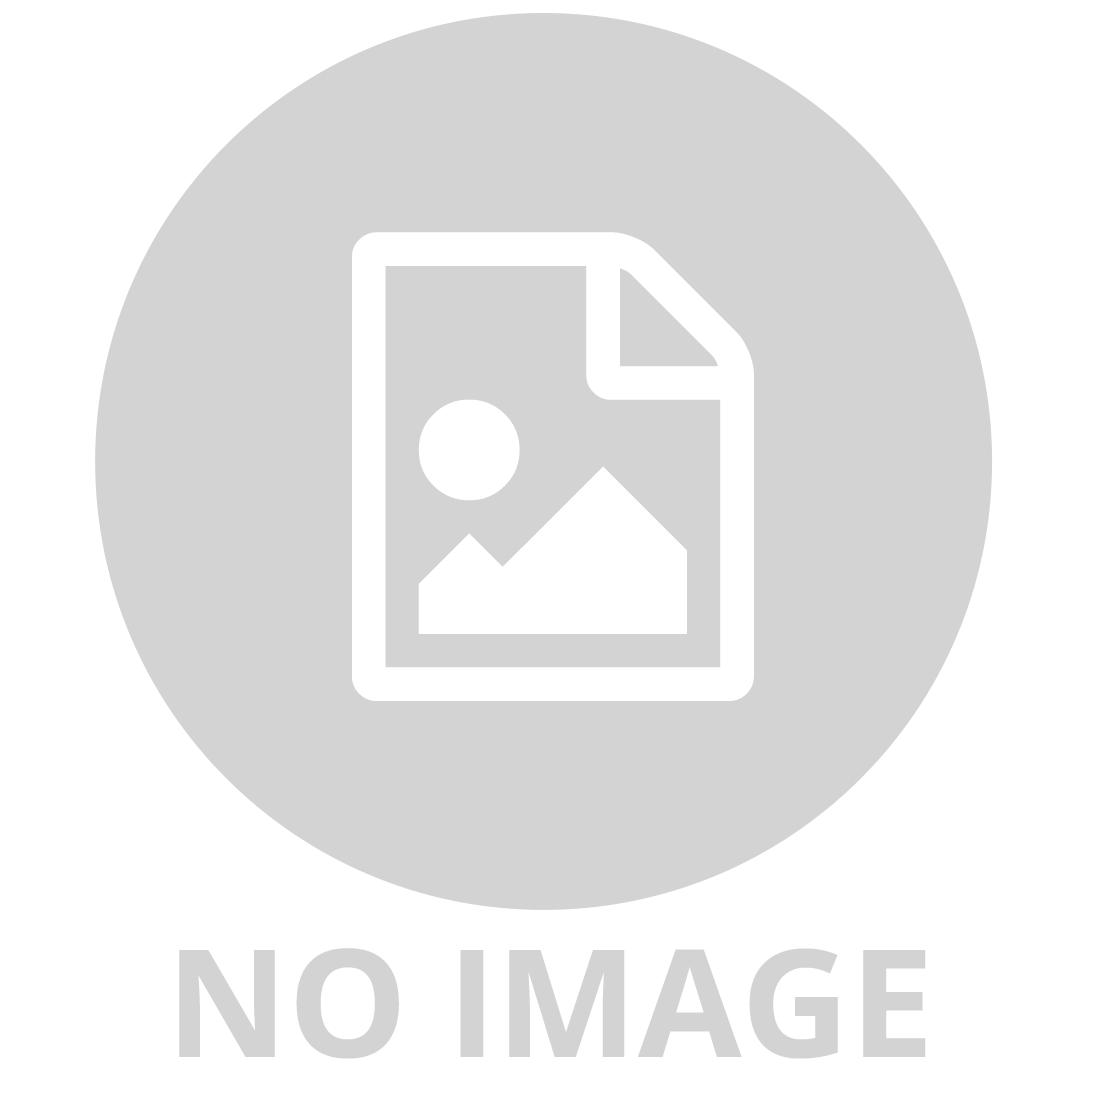 TOYWORLD GIFT CARD